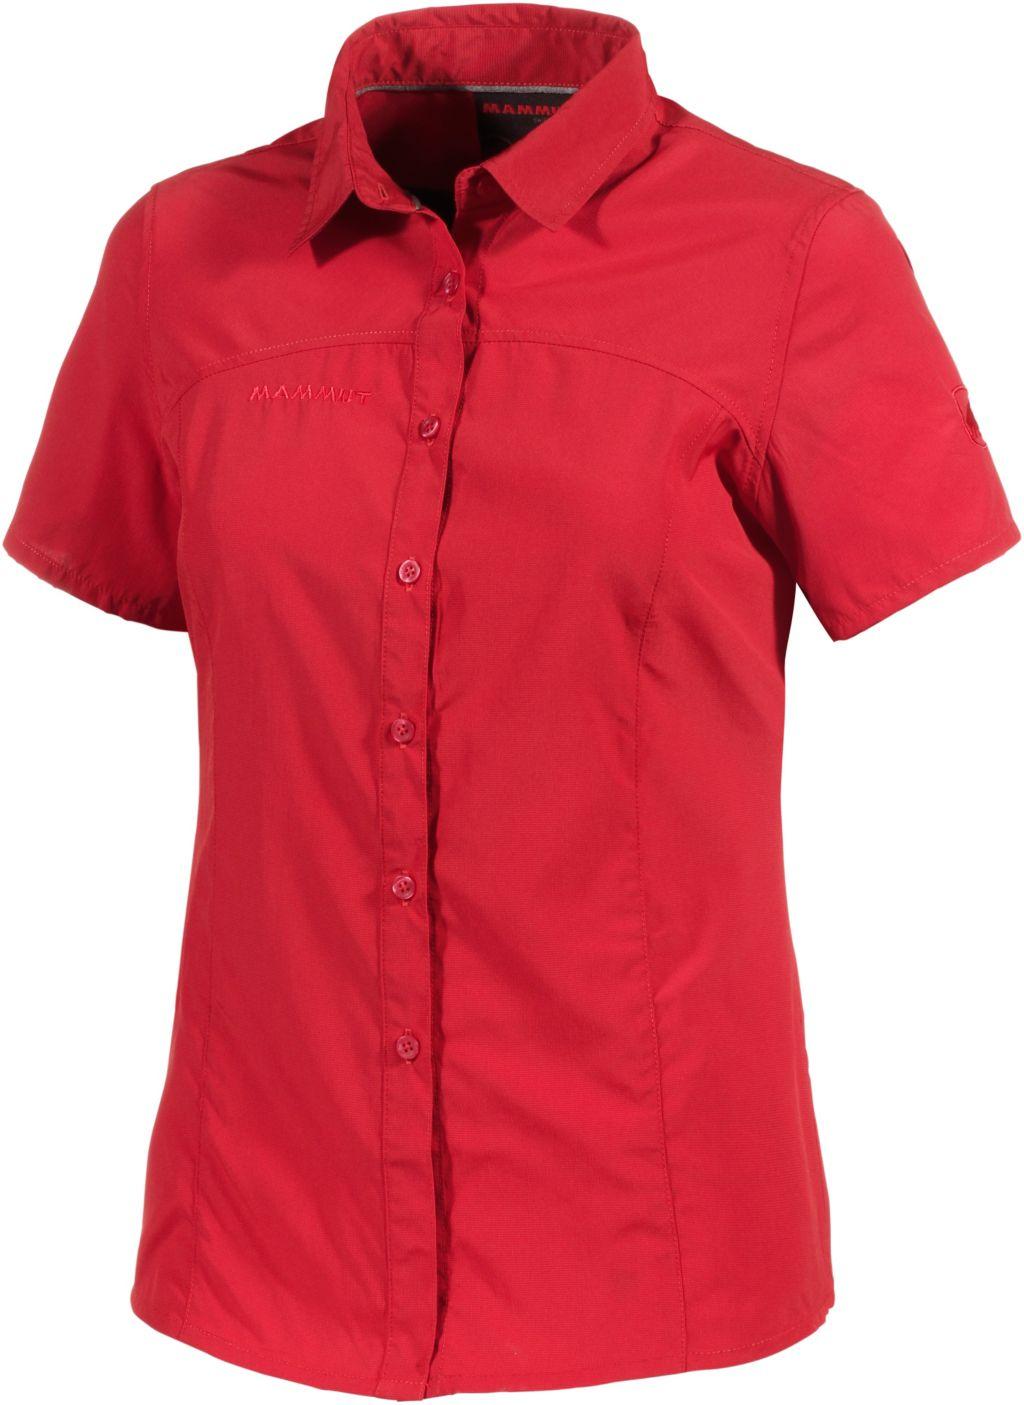 Hera Funktionsbluse Damen in rot, Größe XL